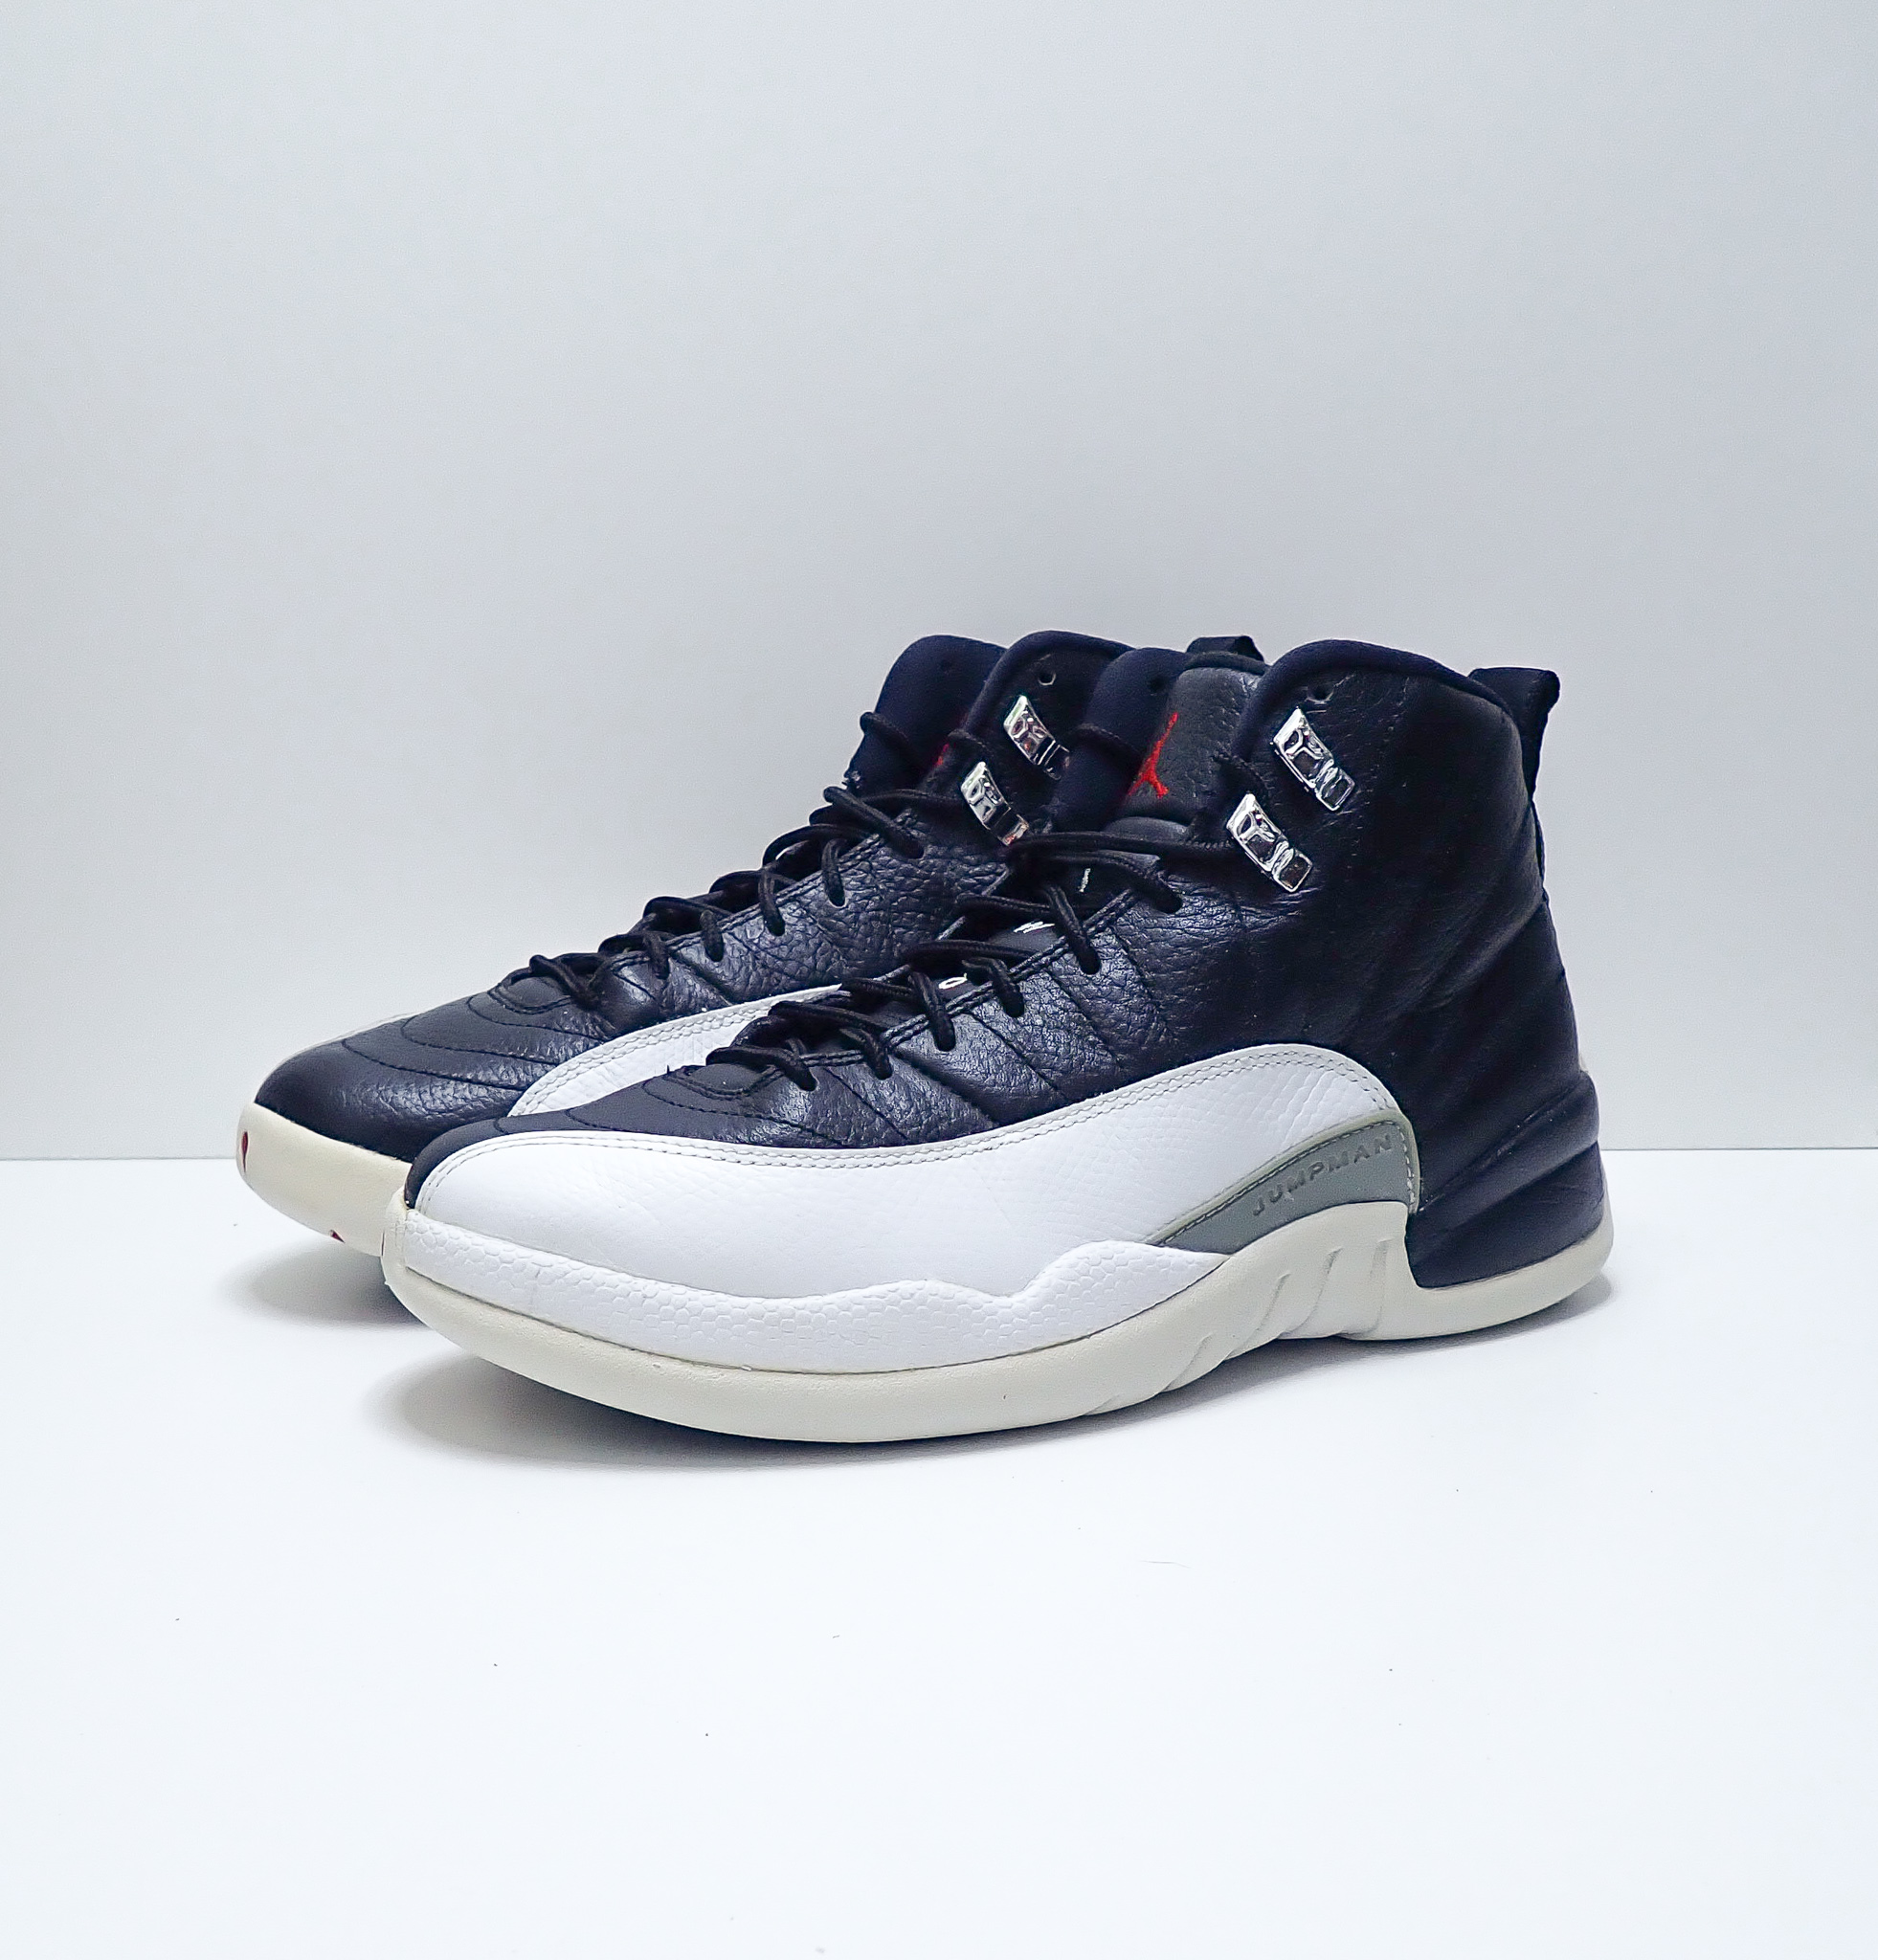 Jordan 12 Playoffs